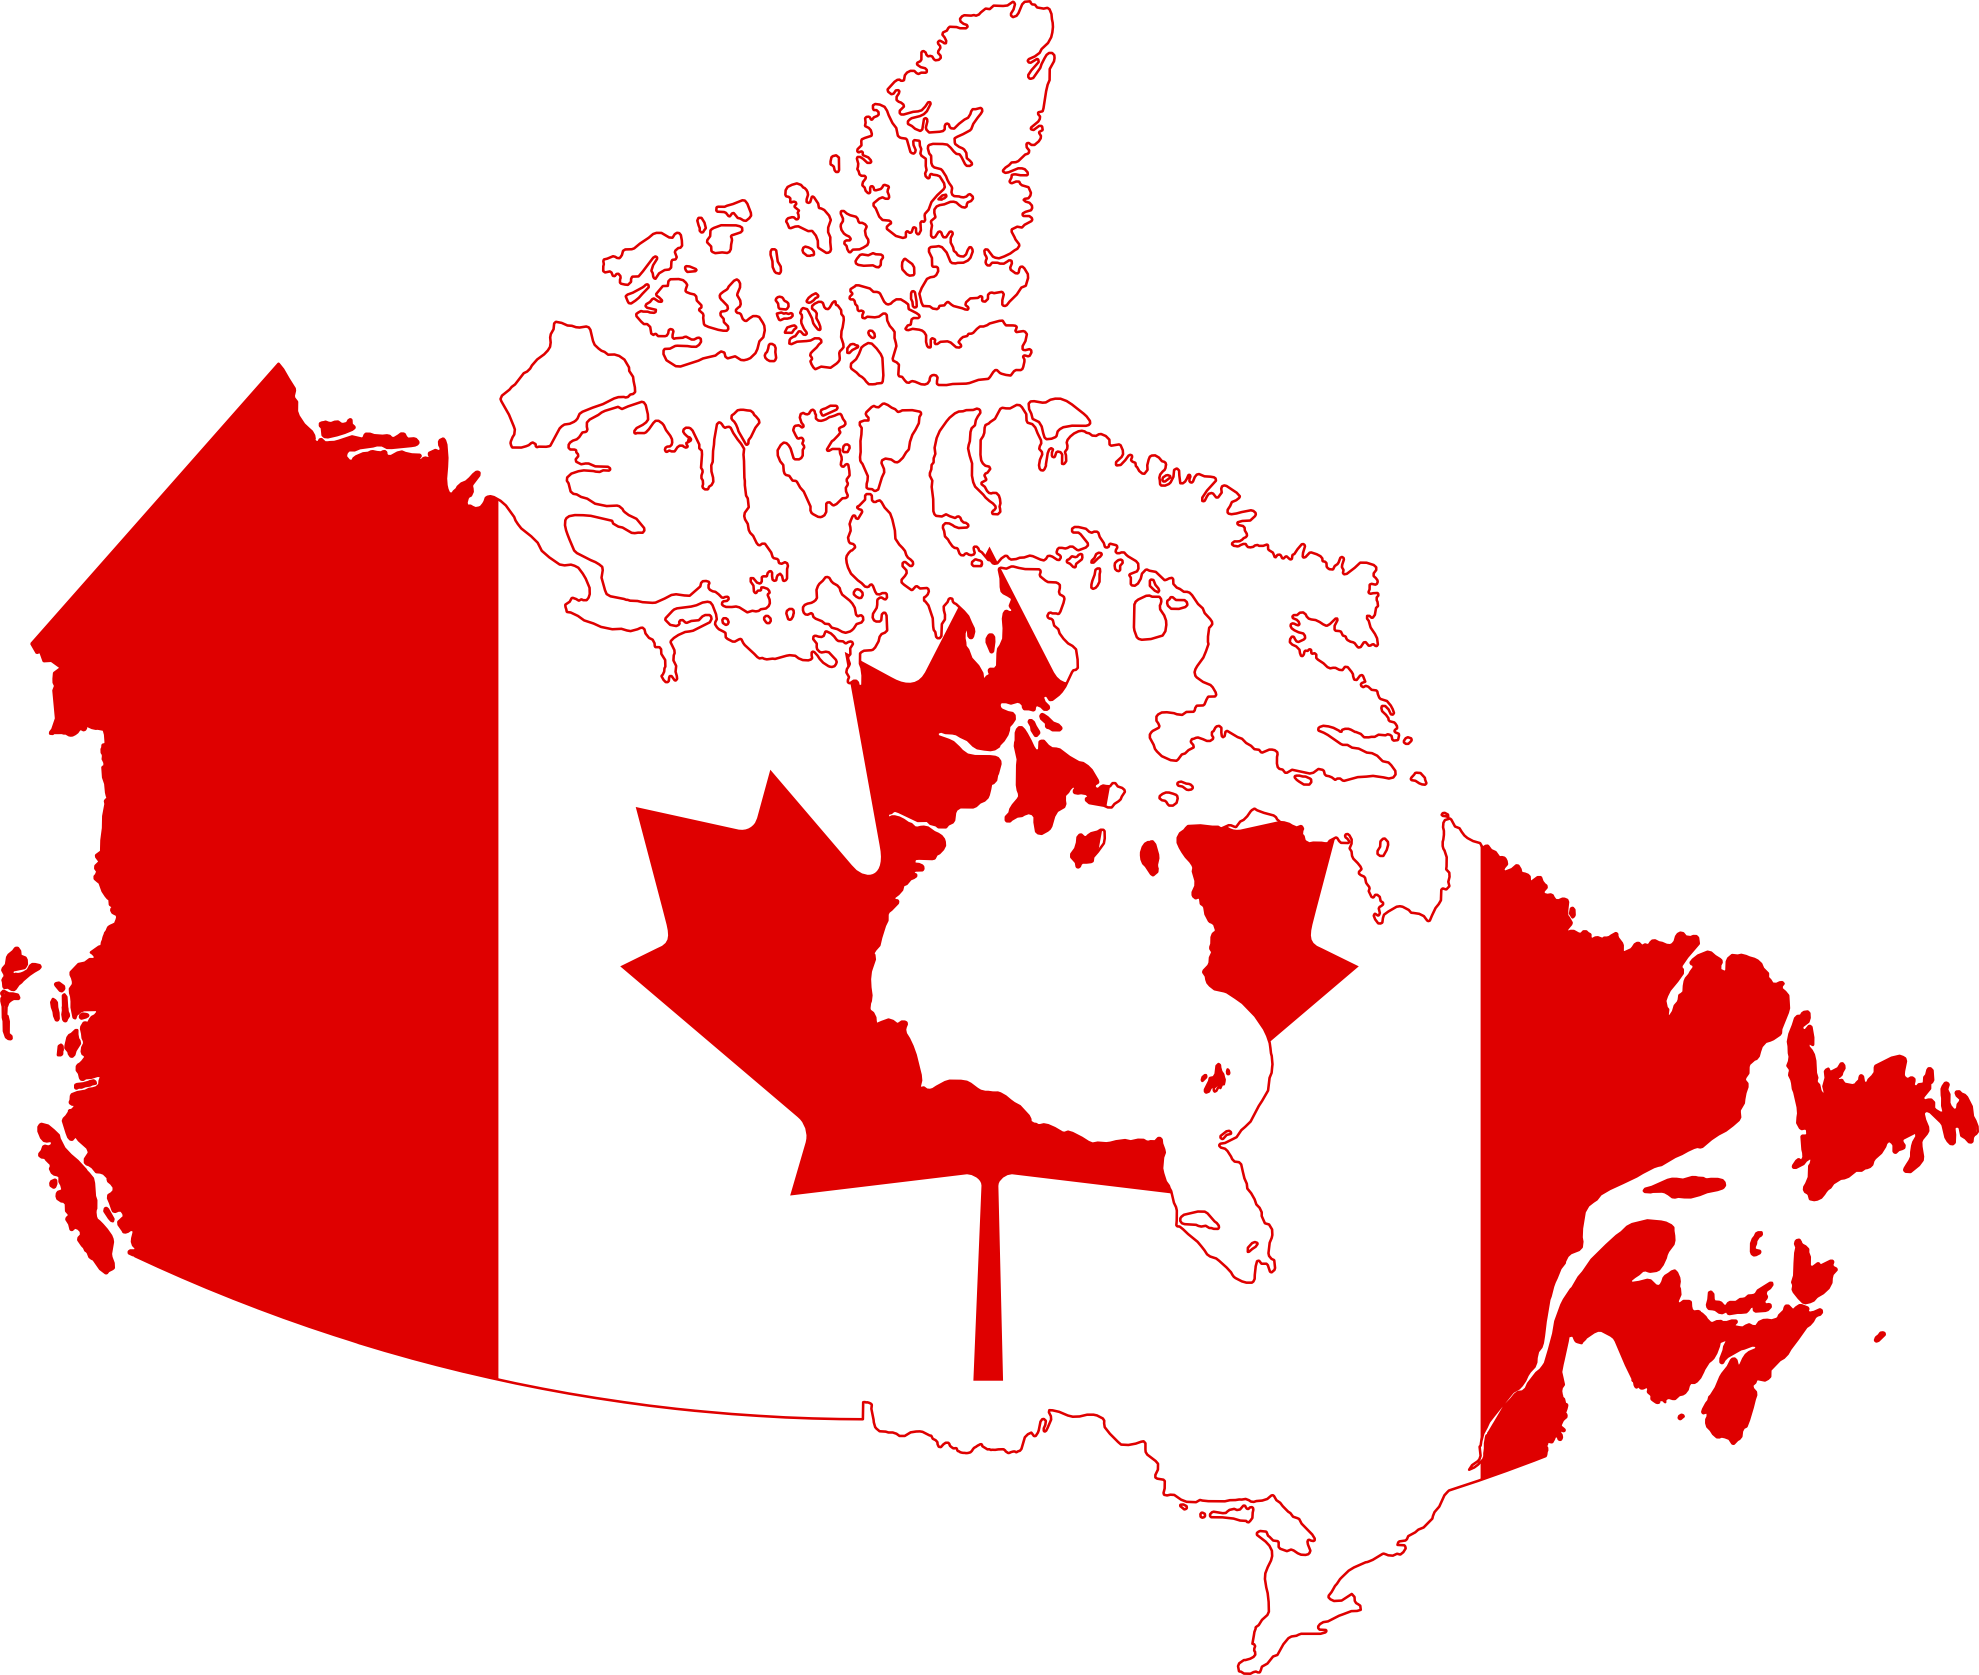 Free canada clipart picture transparent library Free Canada Cliparts, Download Free Clip Art, Free Clip Art on ... picture transparent library